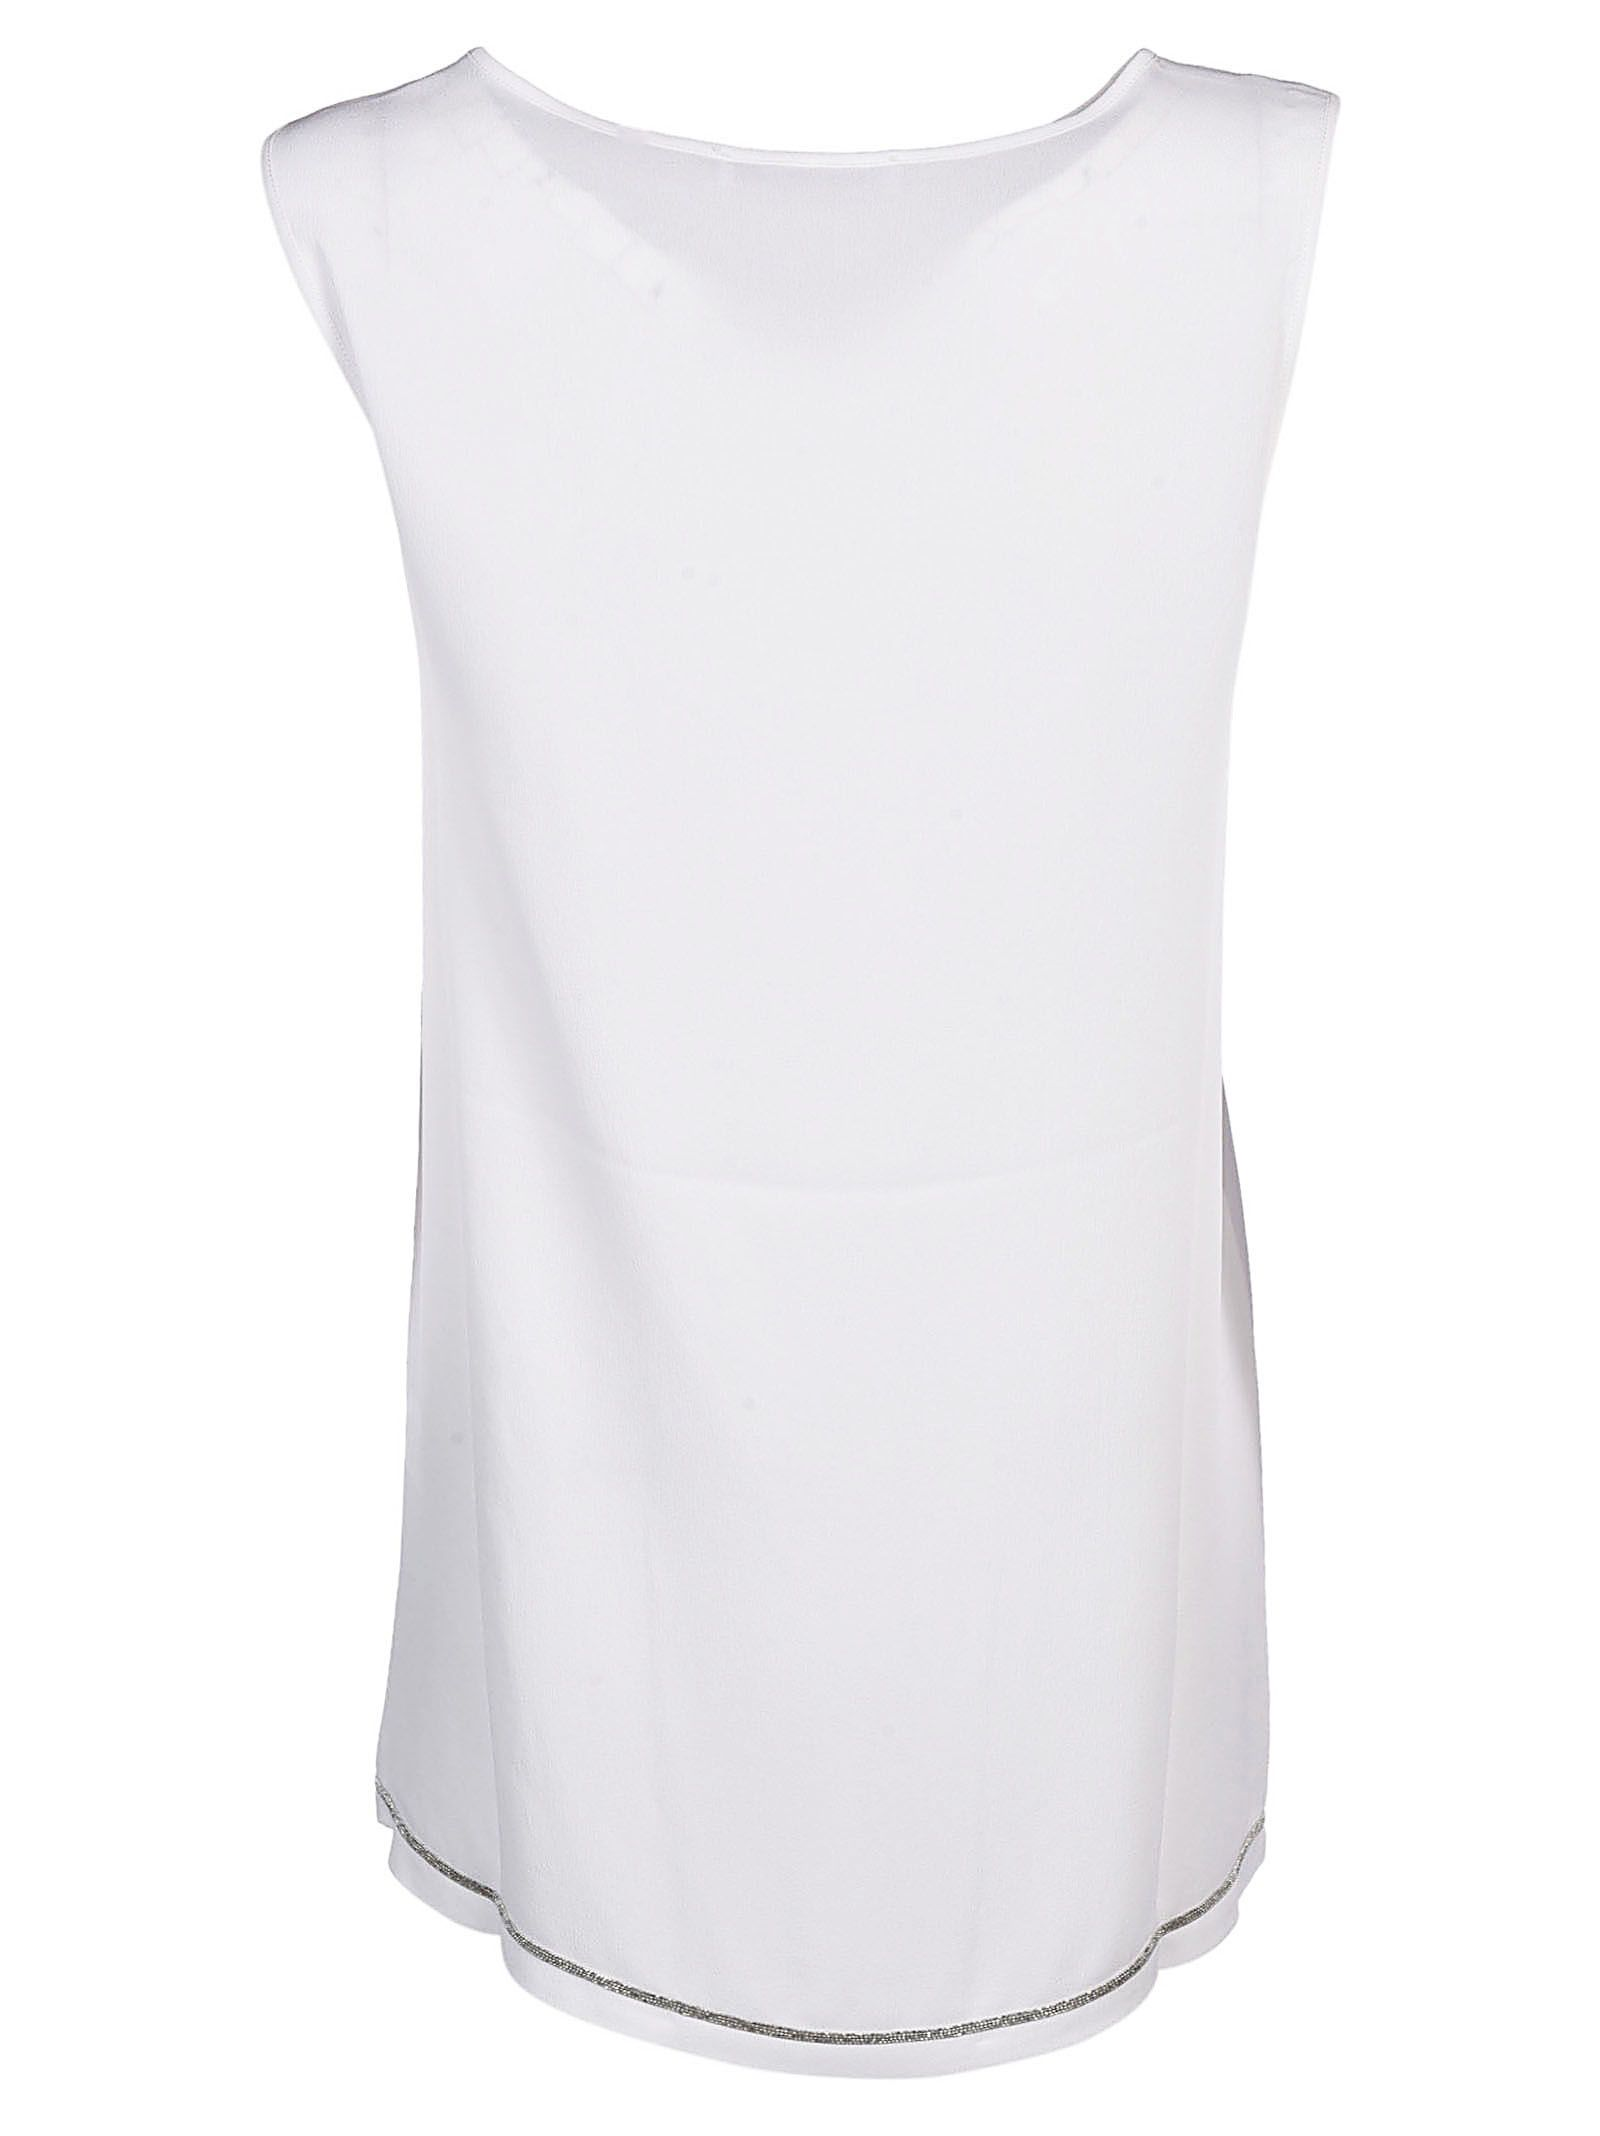 TOPWEAR - T-shirts Fabiana Filippi Cheap Low Price Sale Sale Online Explore For Sale lOfk3